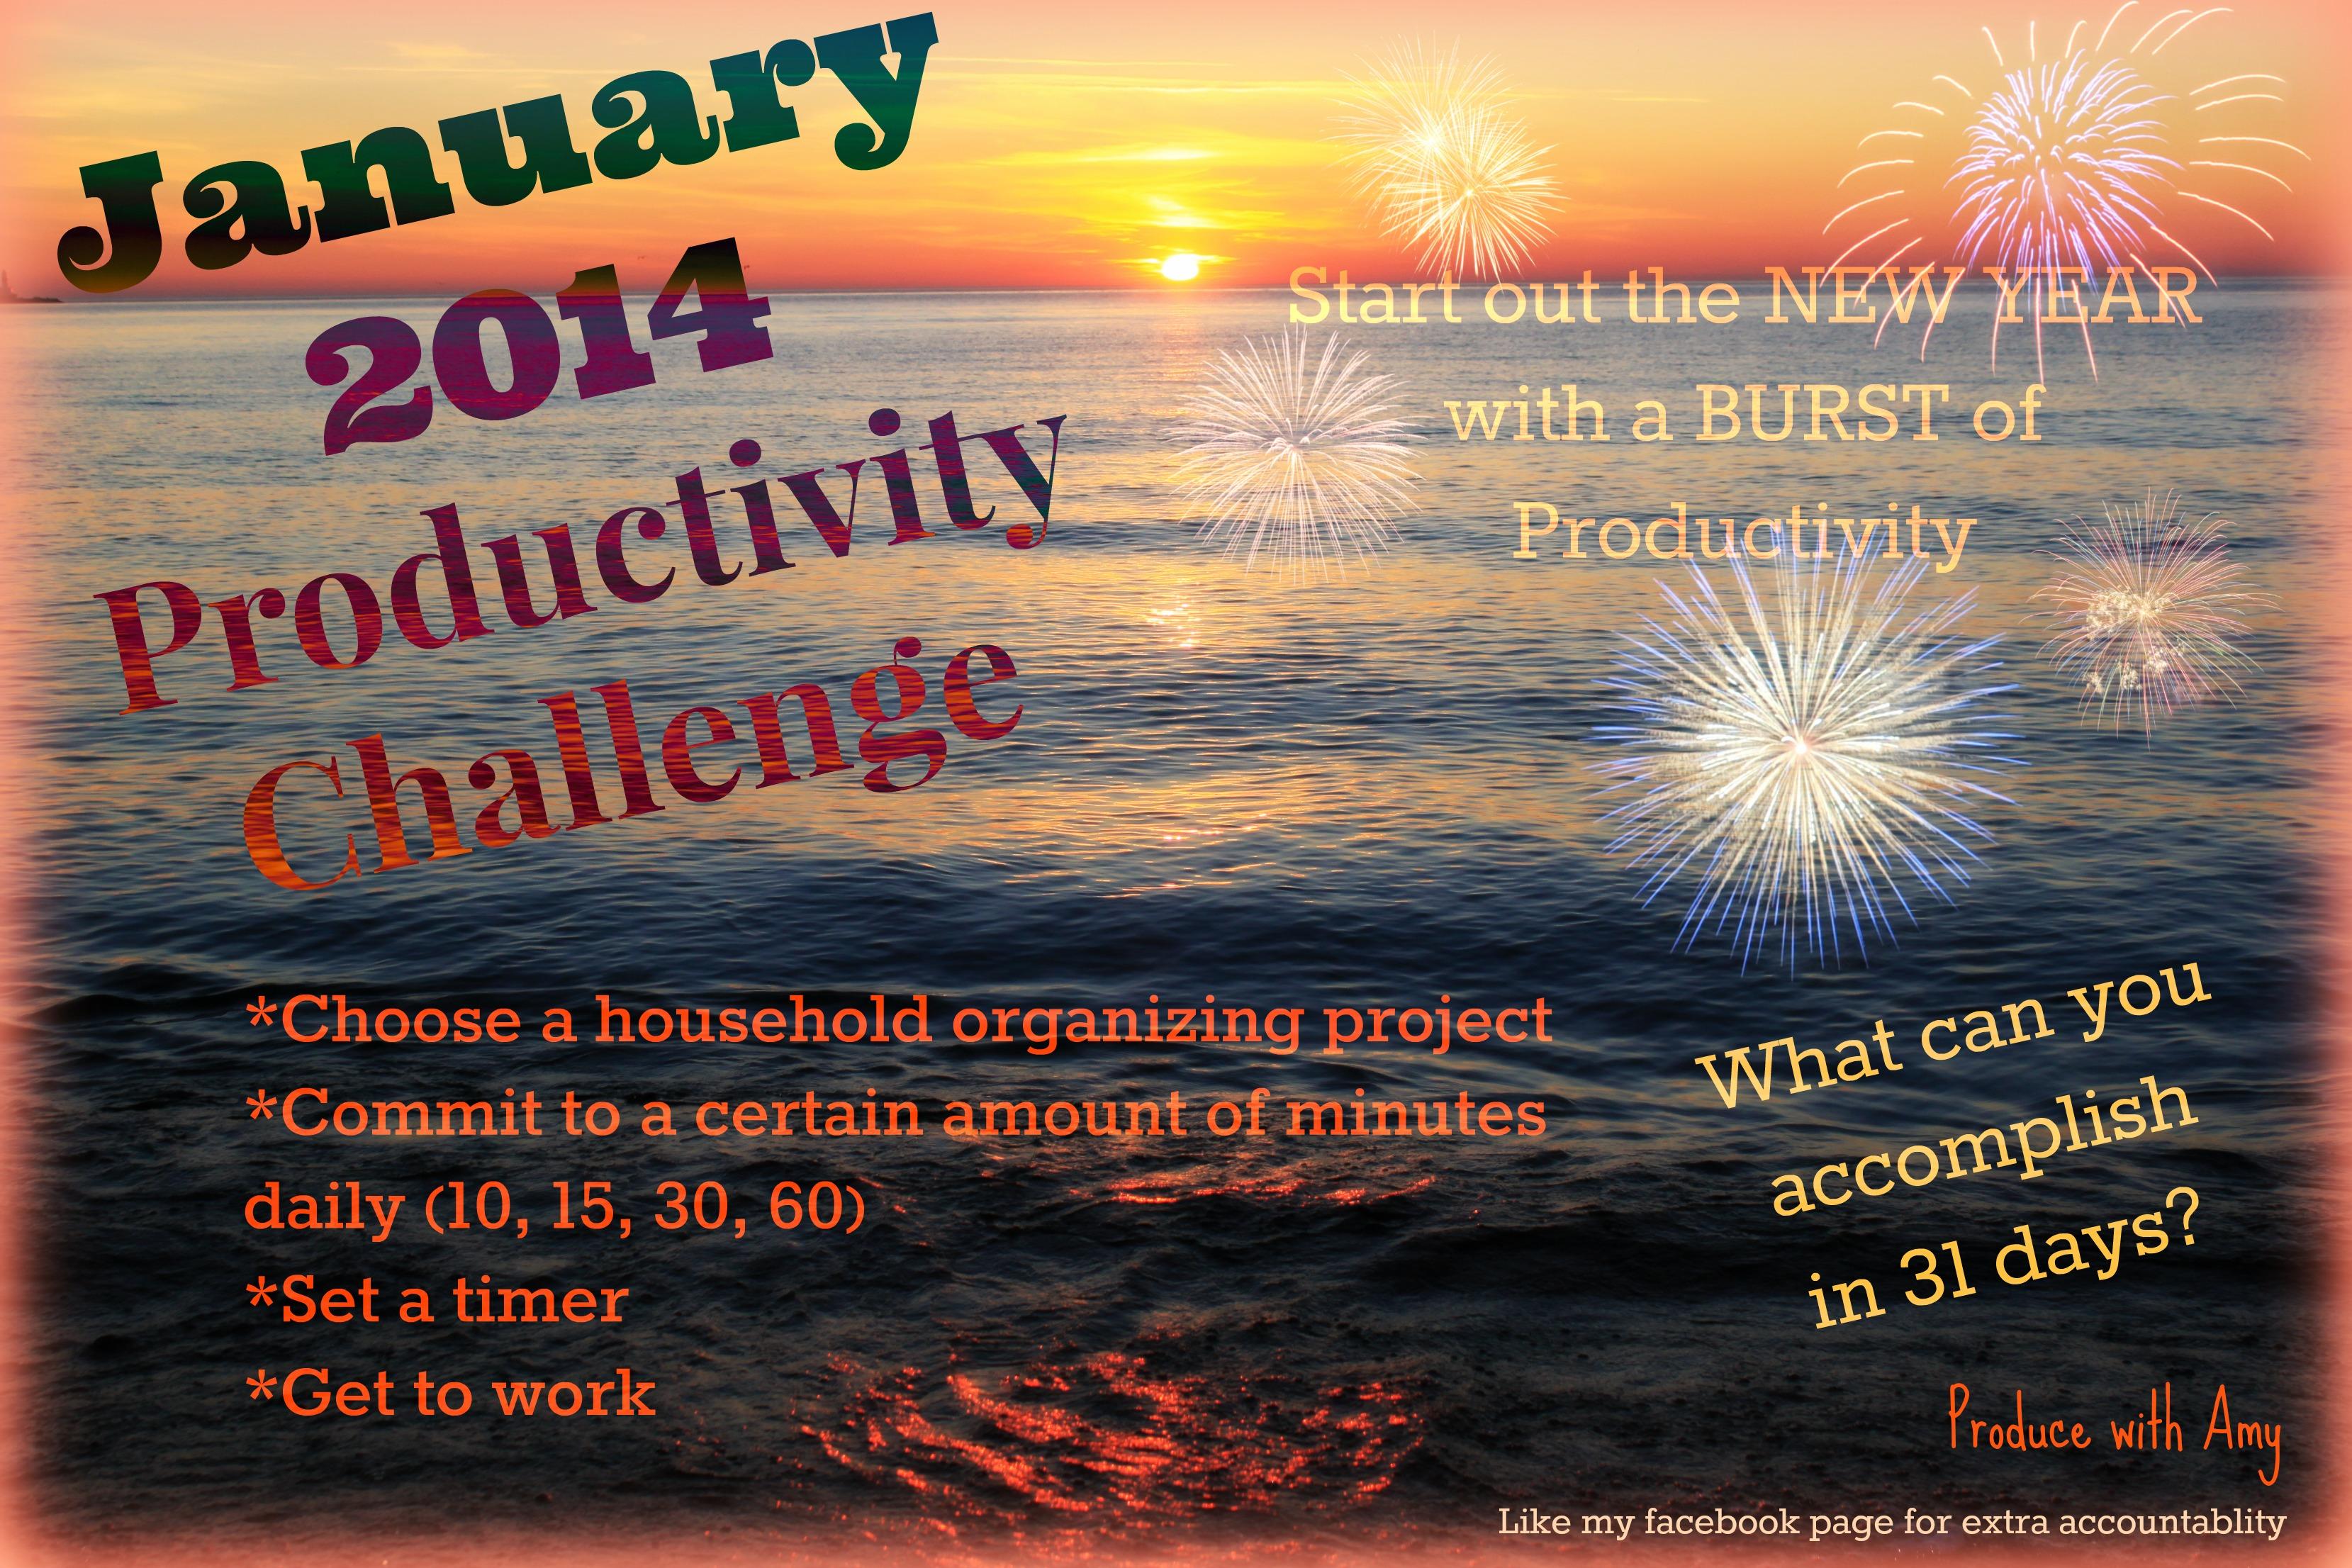 2014 Productivity Challenge